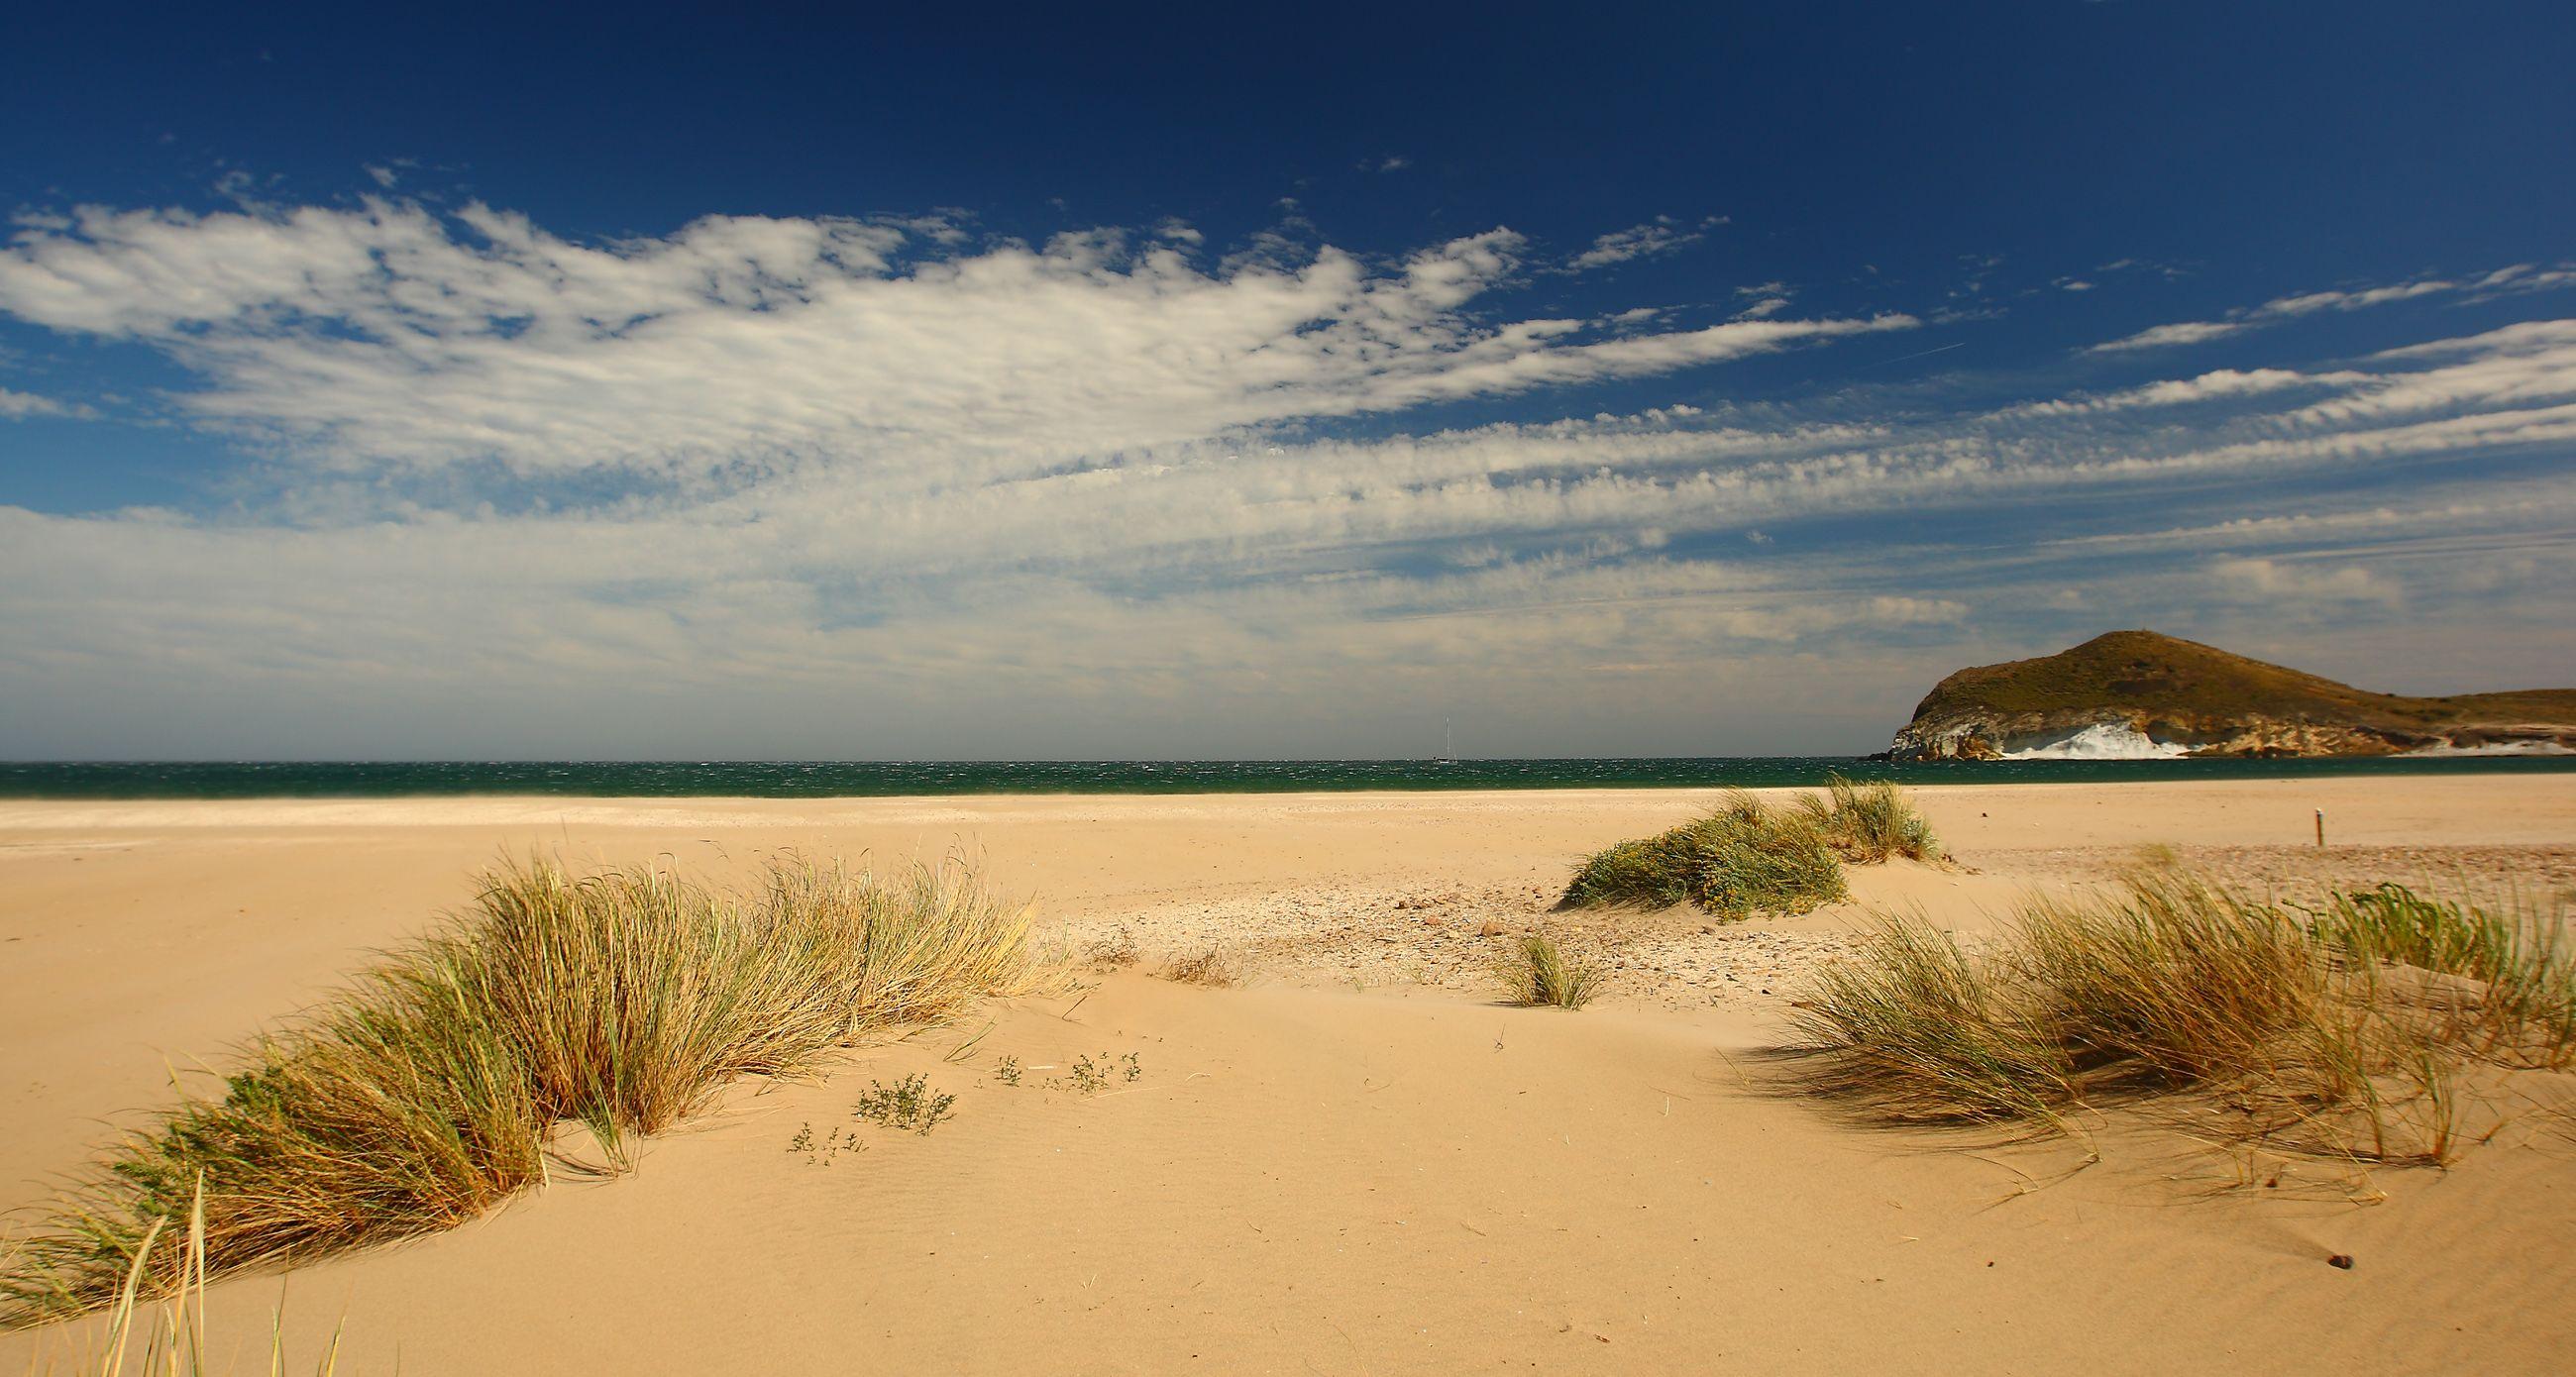 Playa Los Narejos